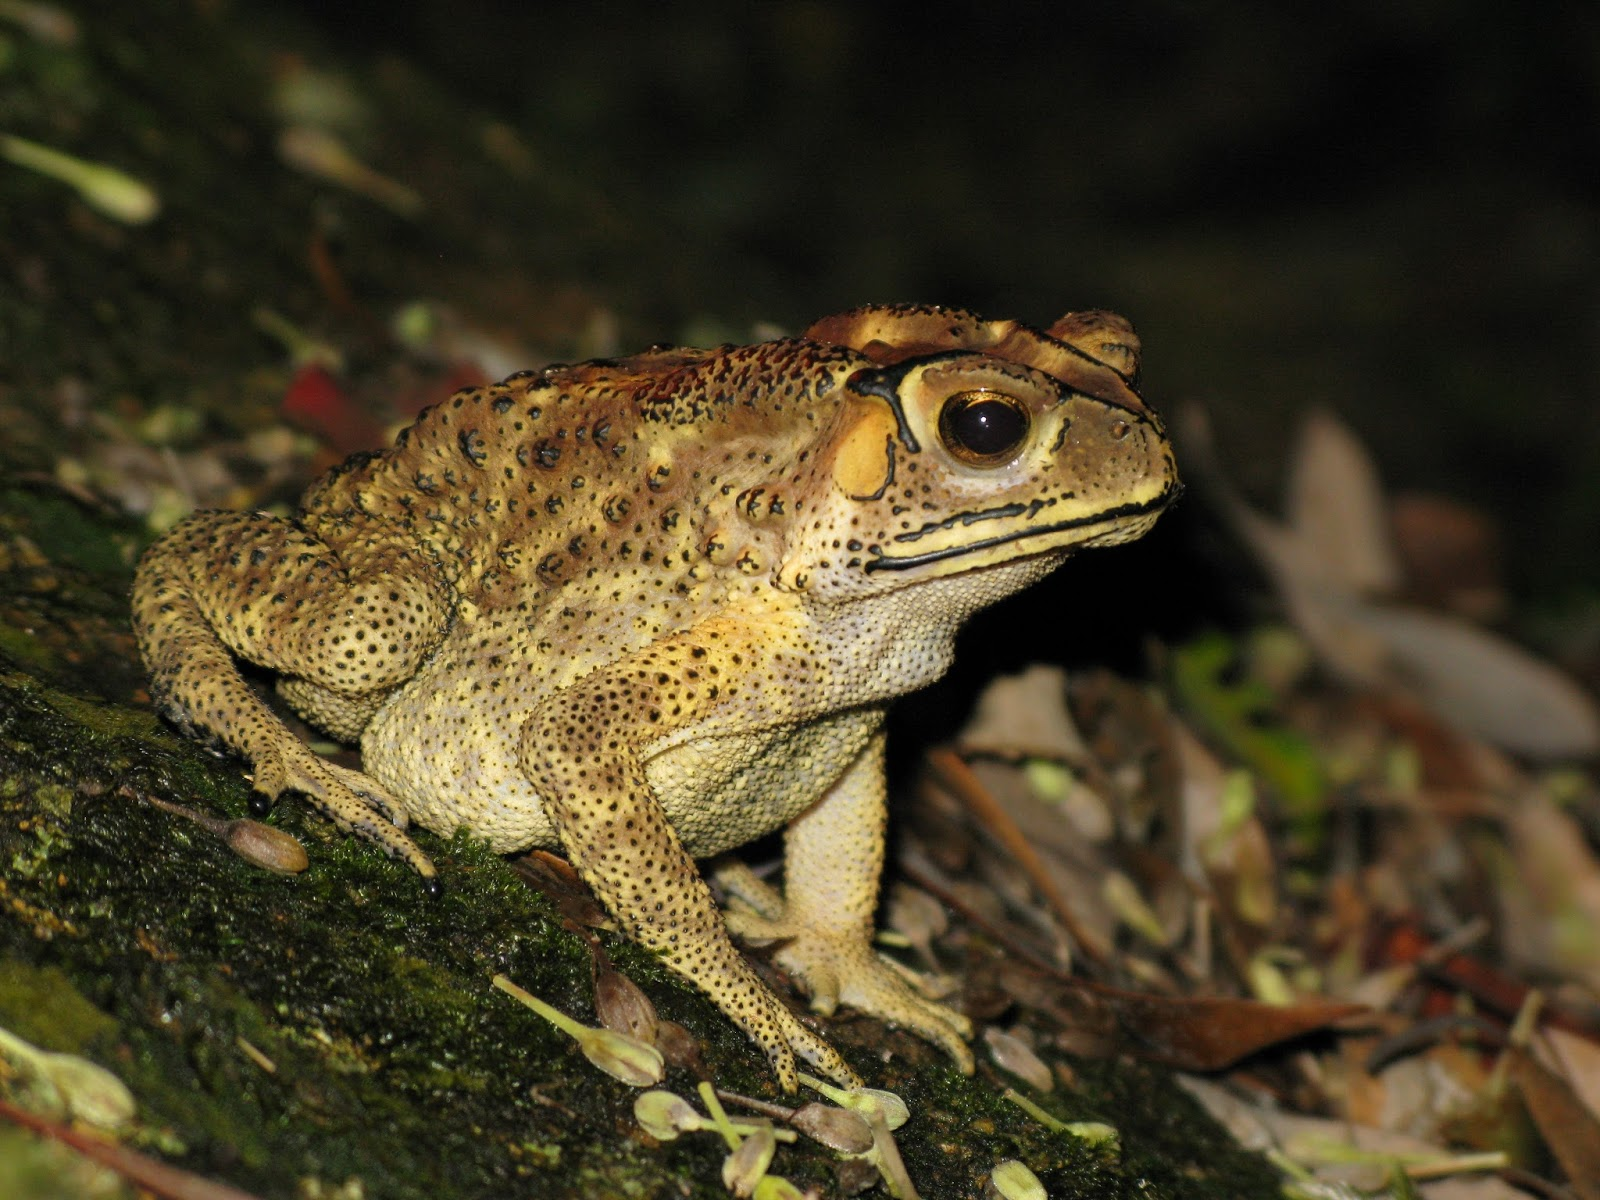 Amphibians: Bufo melanosticus